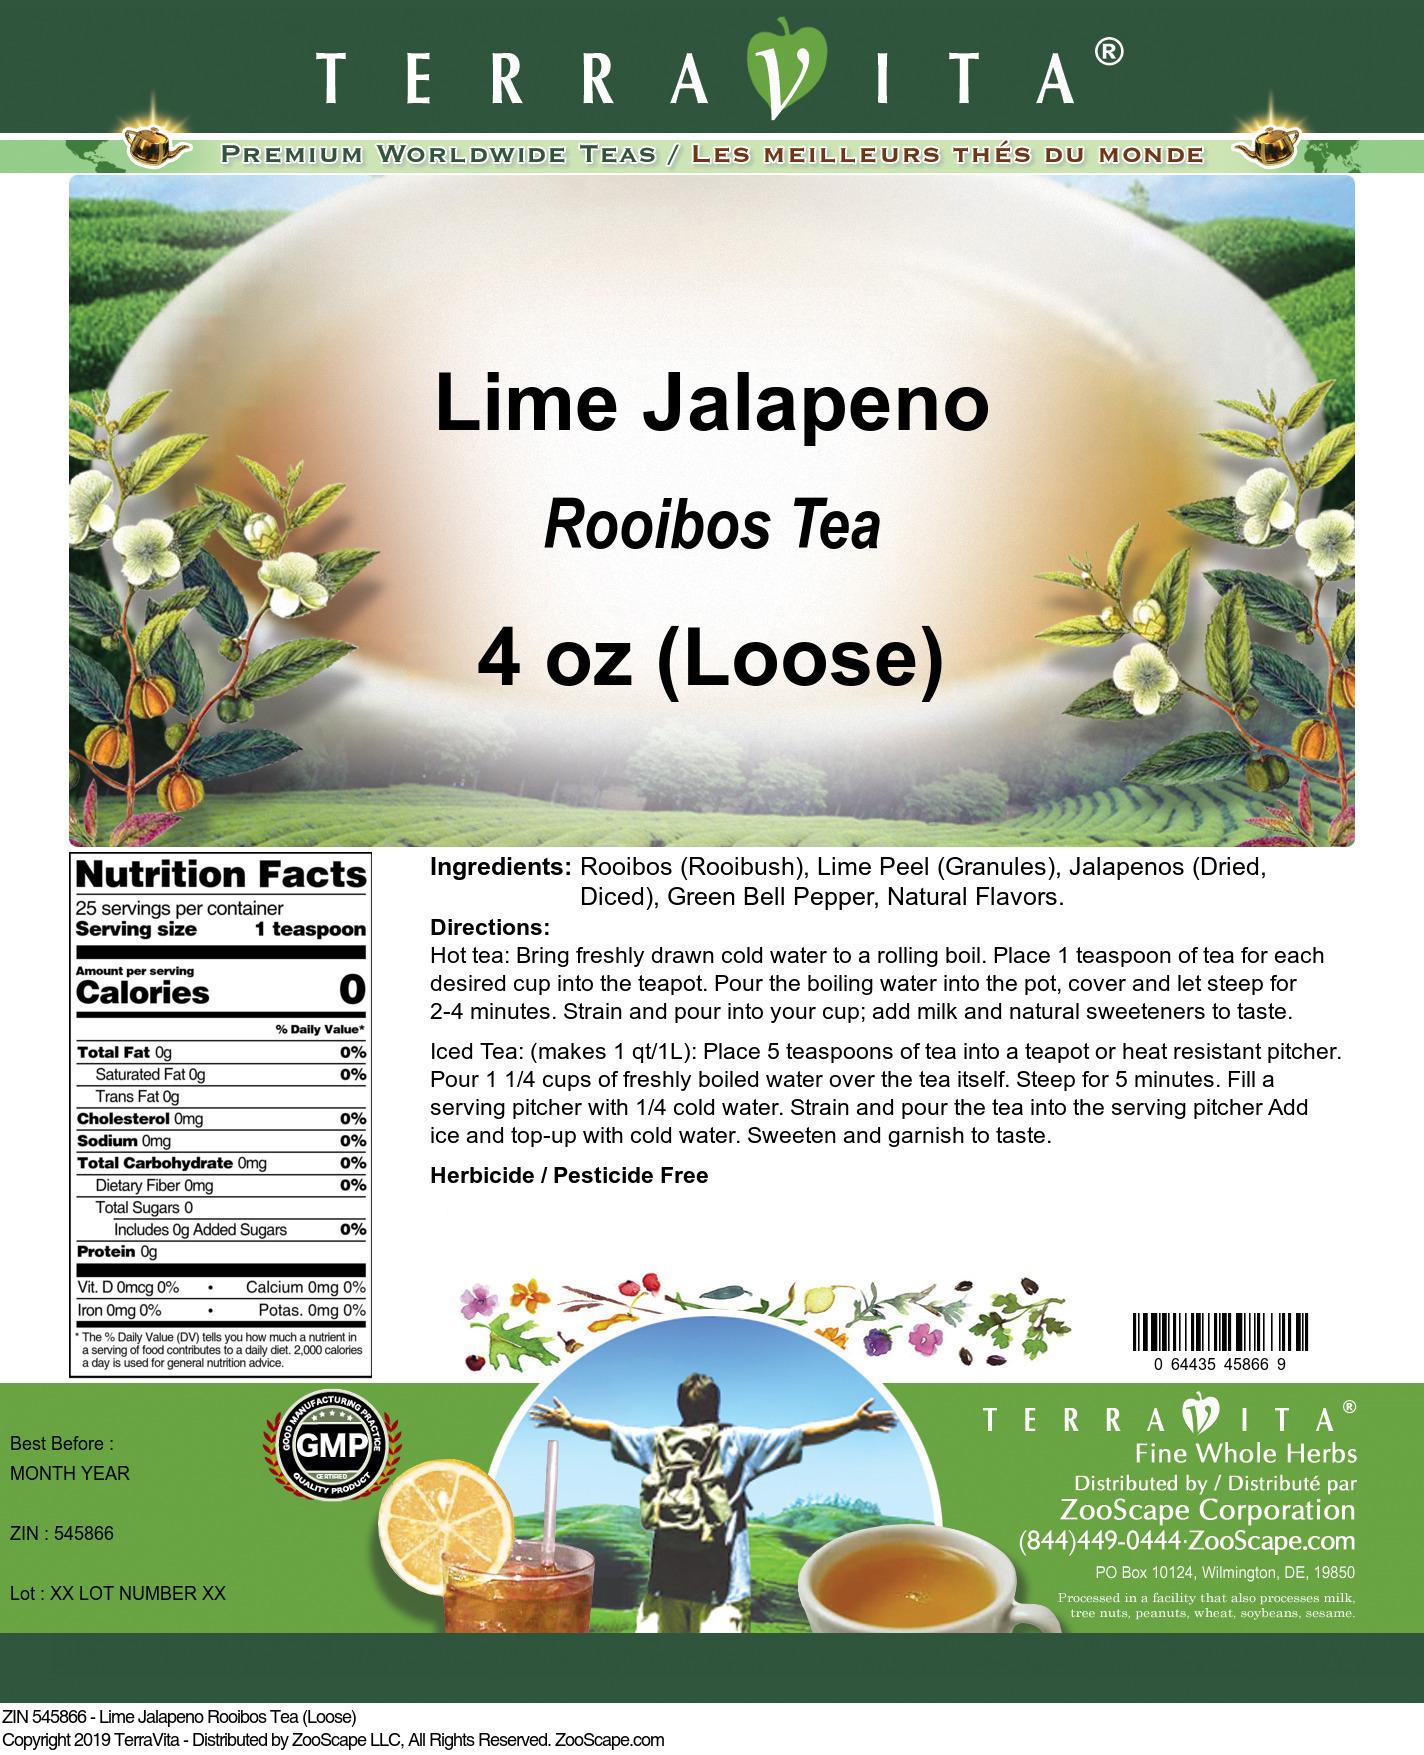 Lime Jalapeno Rooibos Tea (Loose)